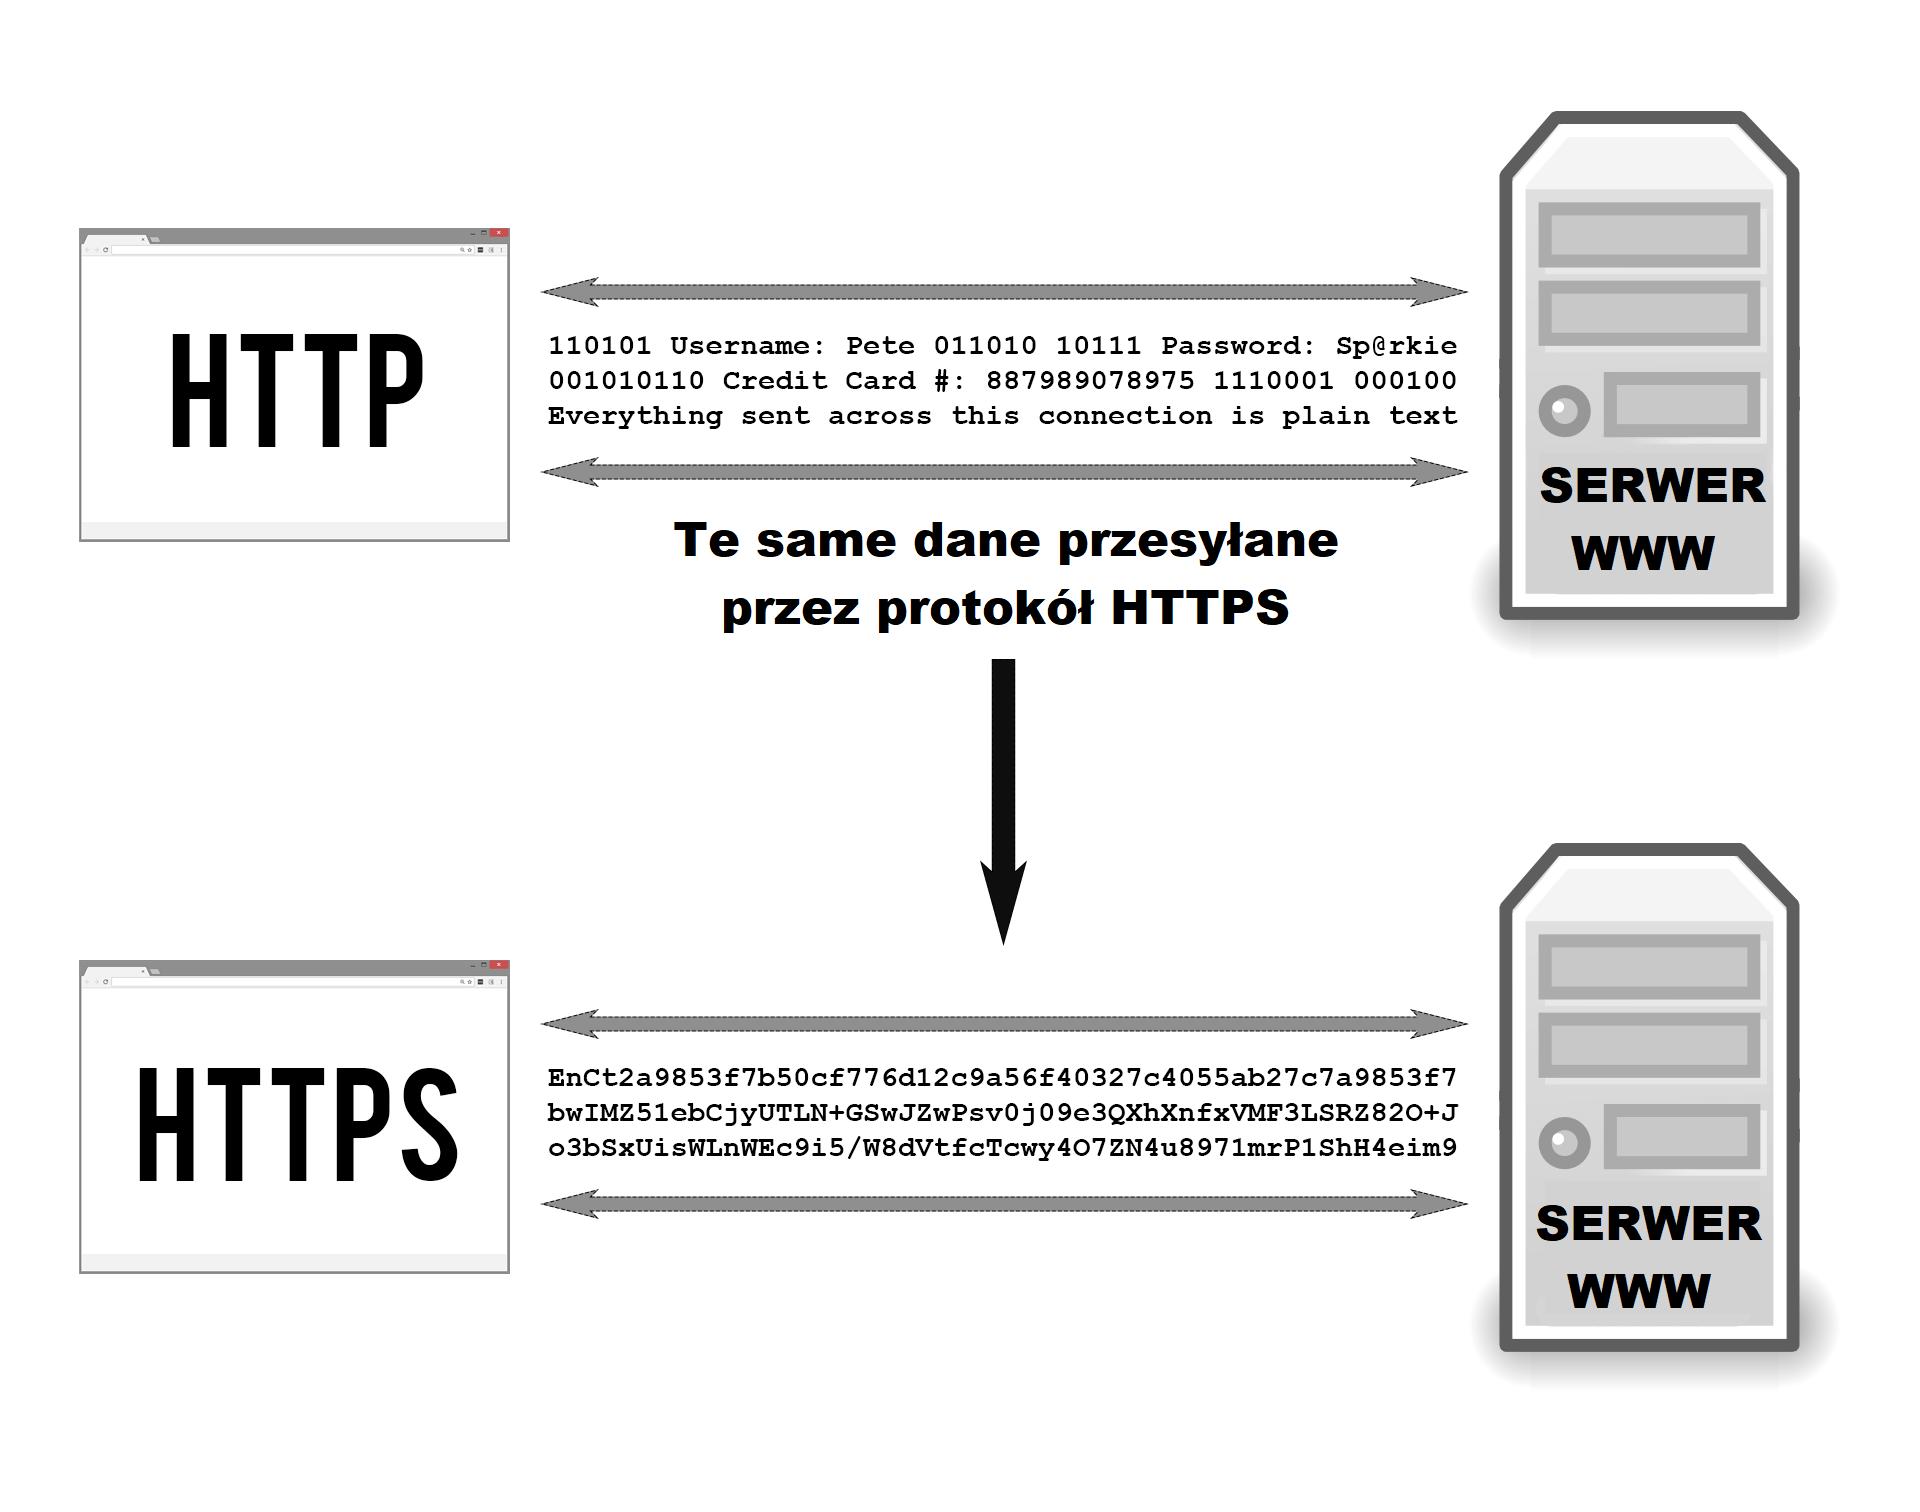 Protokół HTTPS w praktyce